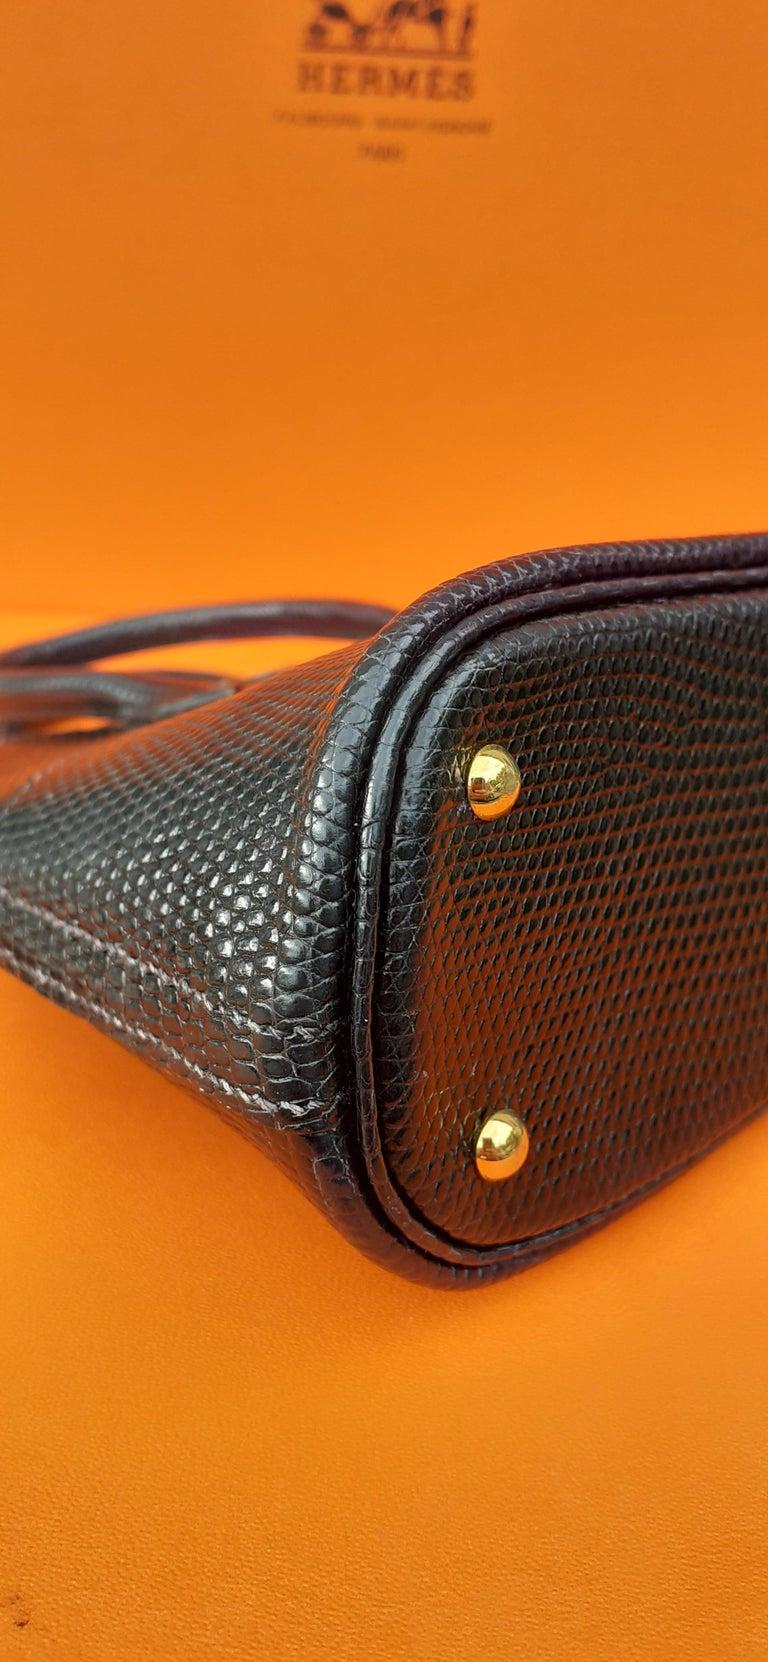 Exceptional Hermès Micro Bolide Bag Black Lizard Golden Hdw 16 cm RARE For Sale 5